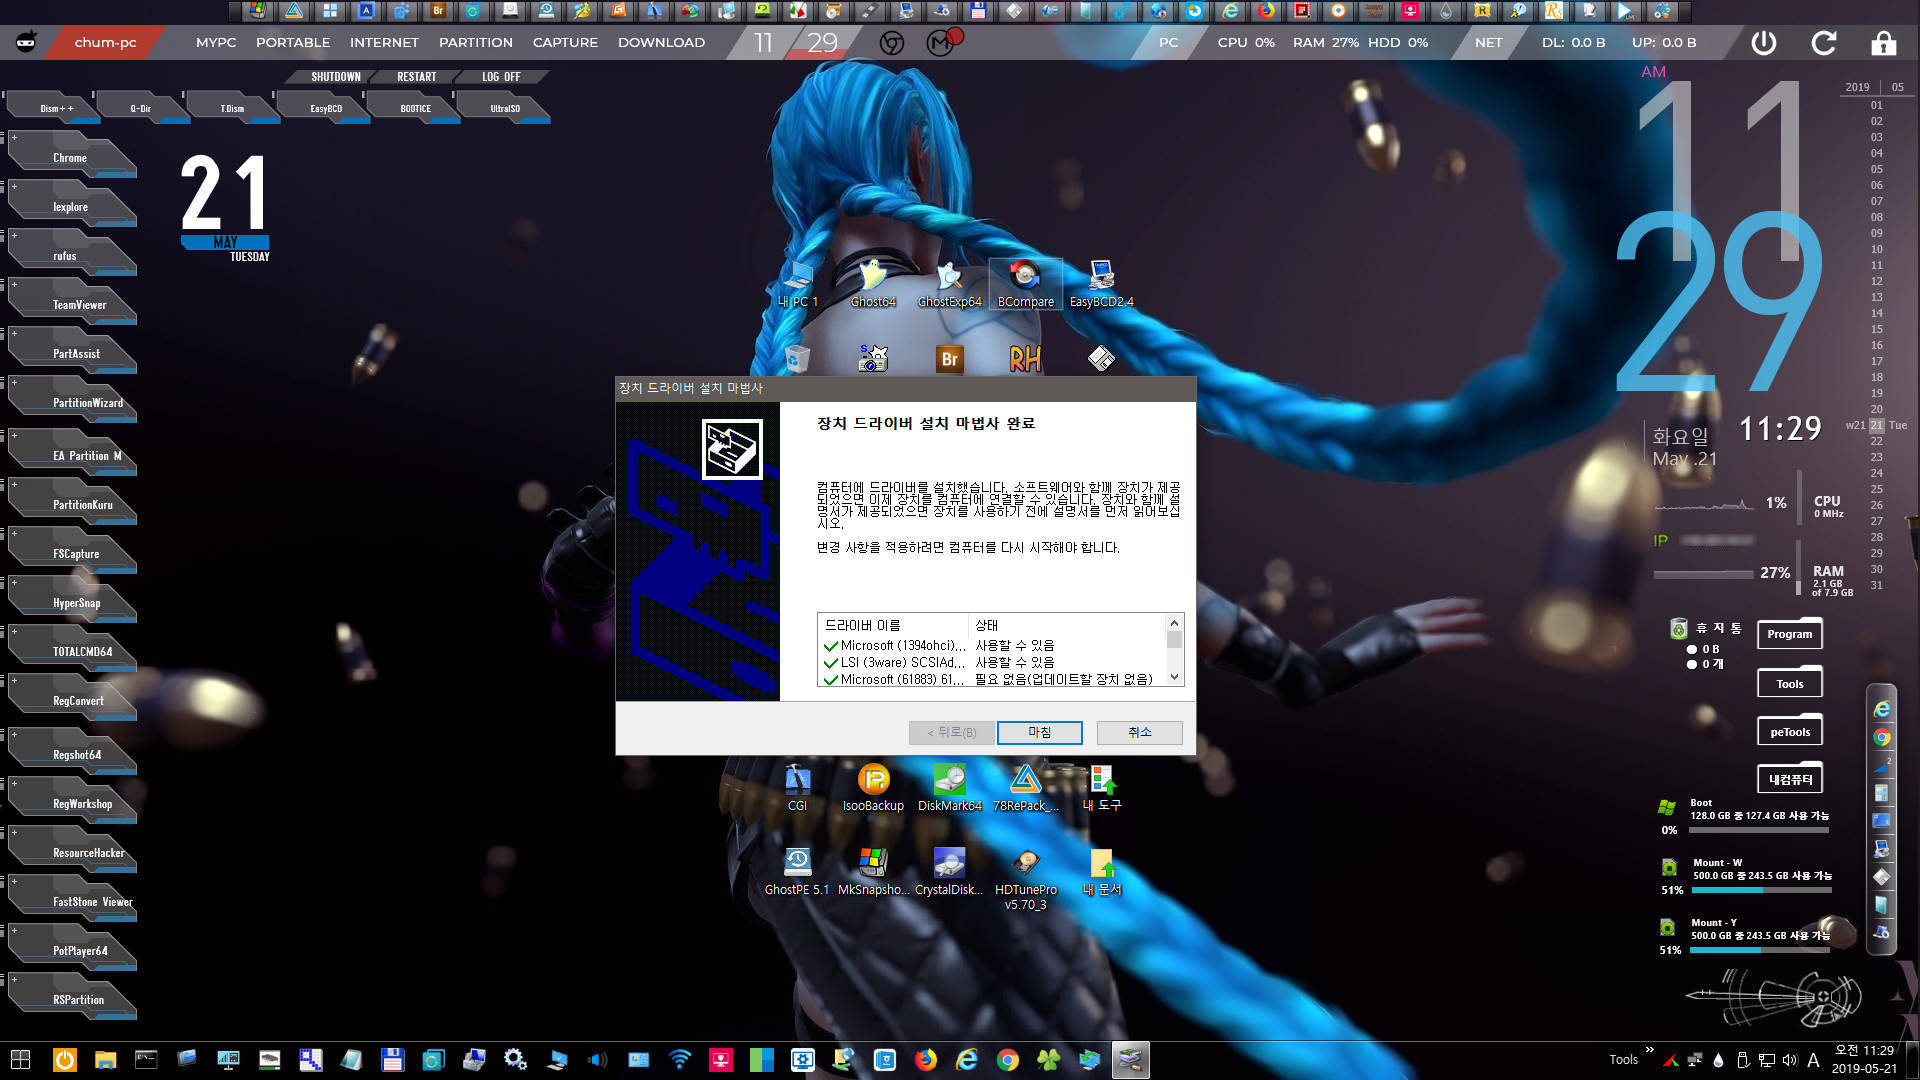 Win10XPE_x64_Chum_190520_0003-02-01.jpg